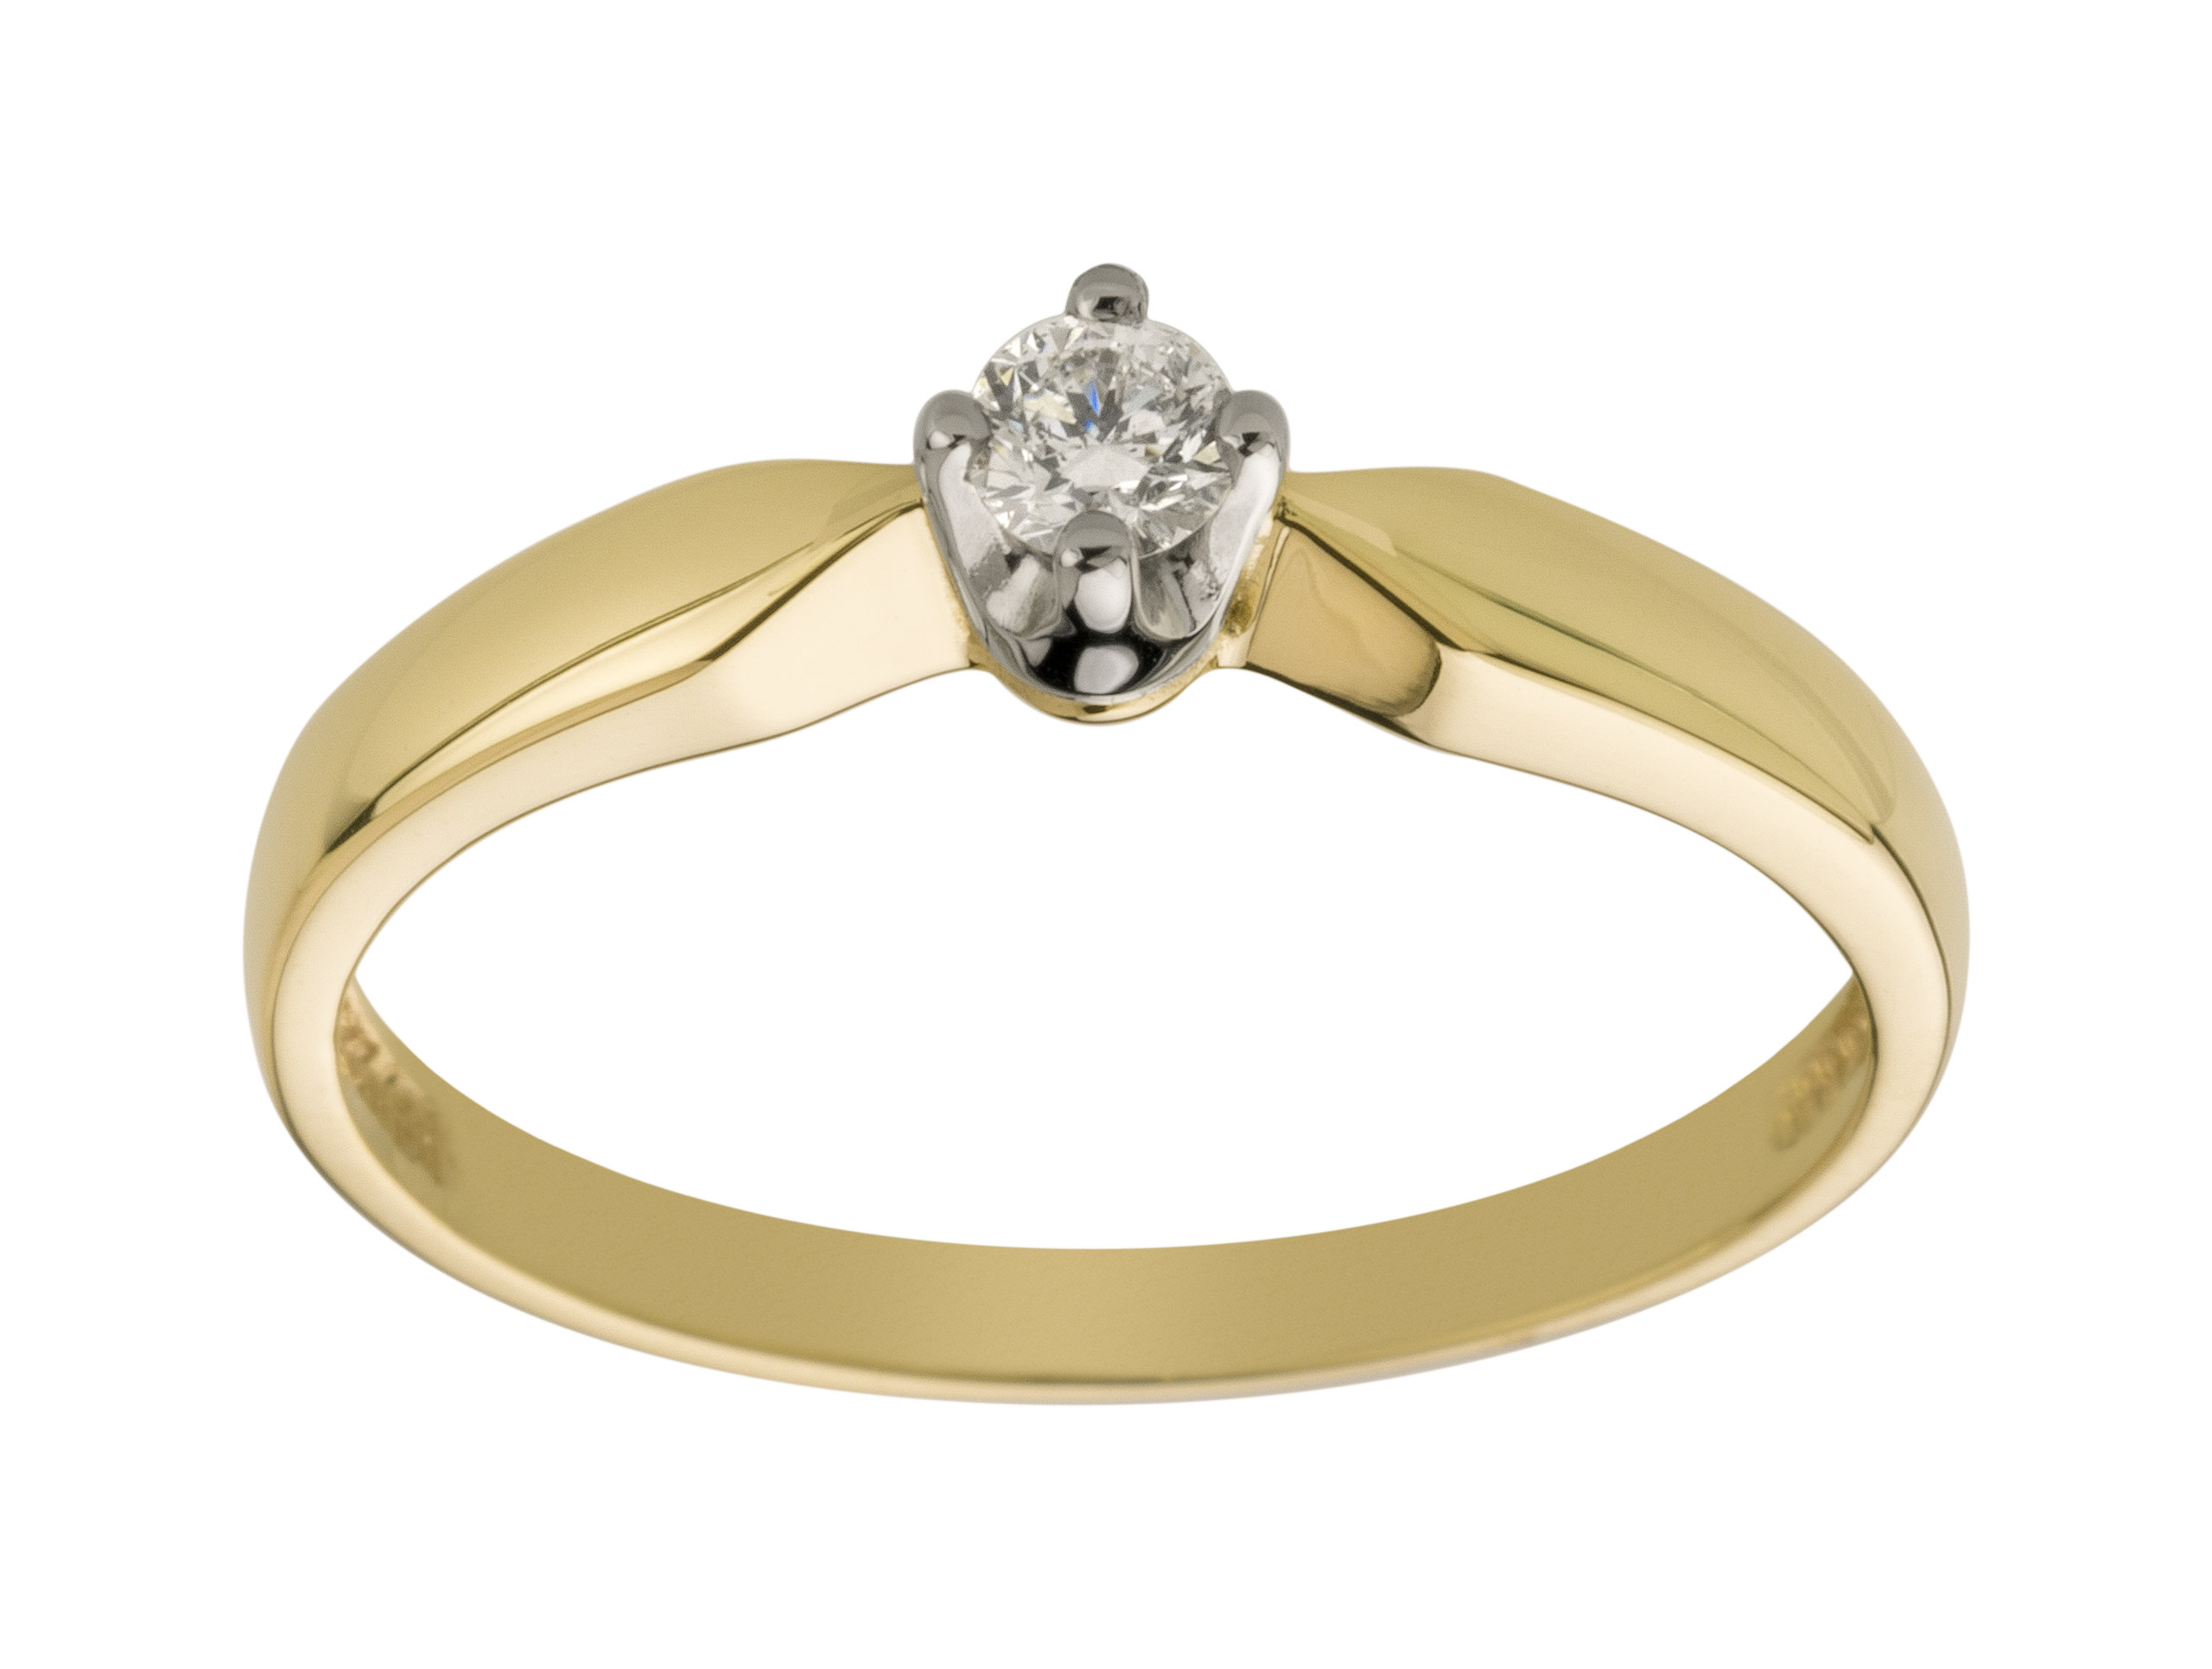 Item GOLD two-tone DIAMOND RING, 0.09 ct